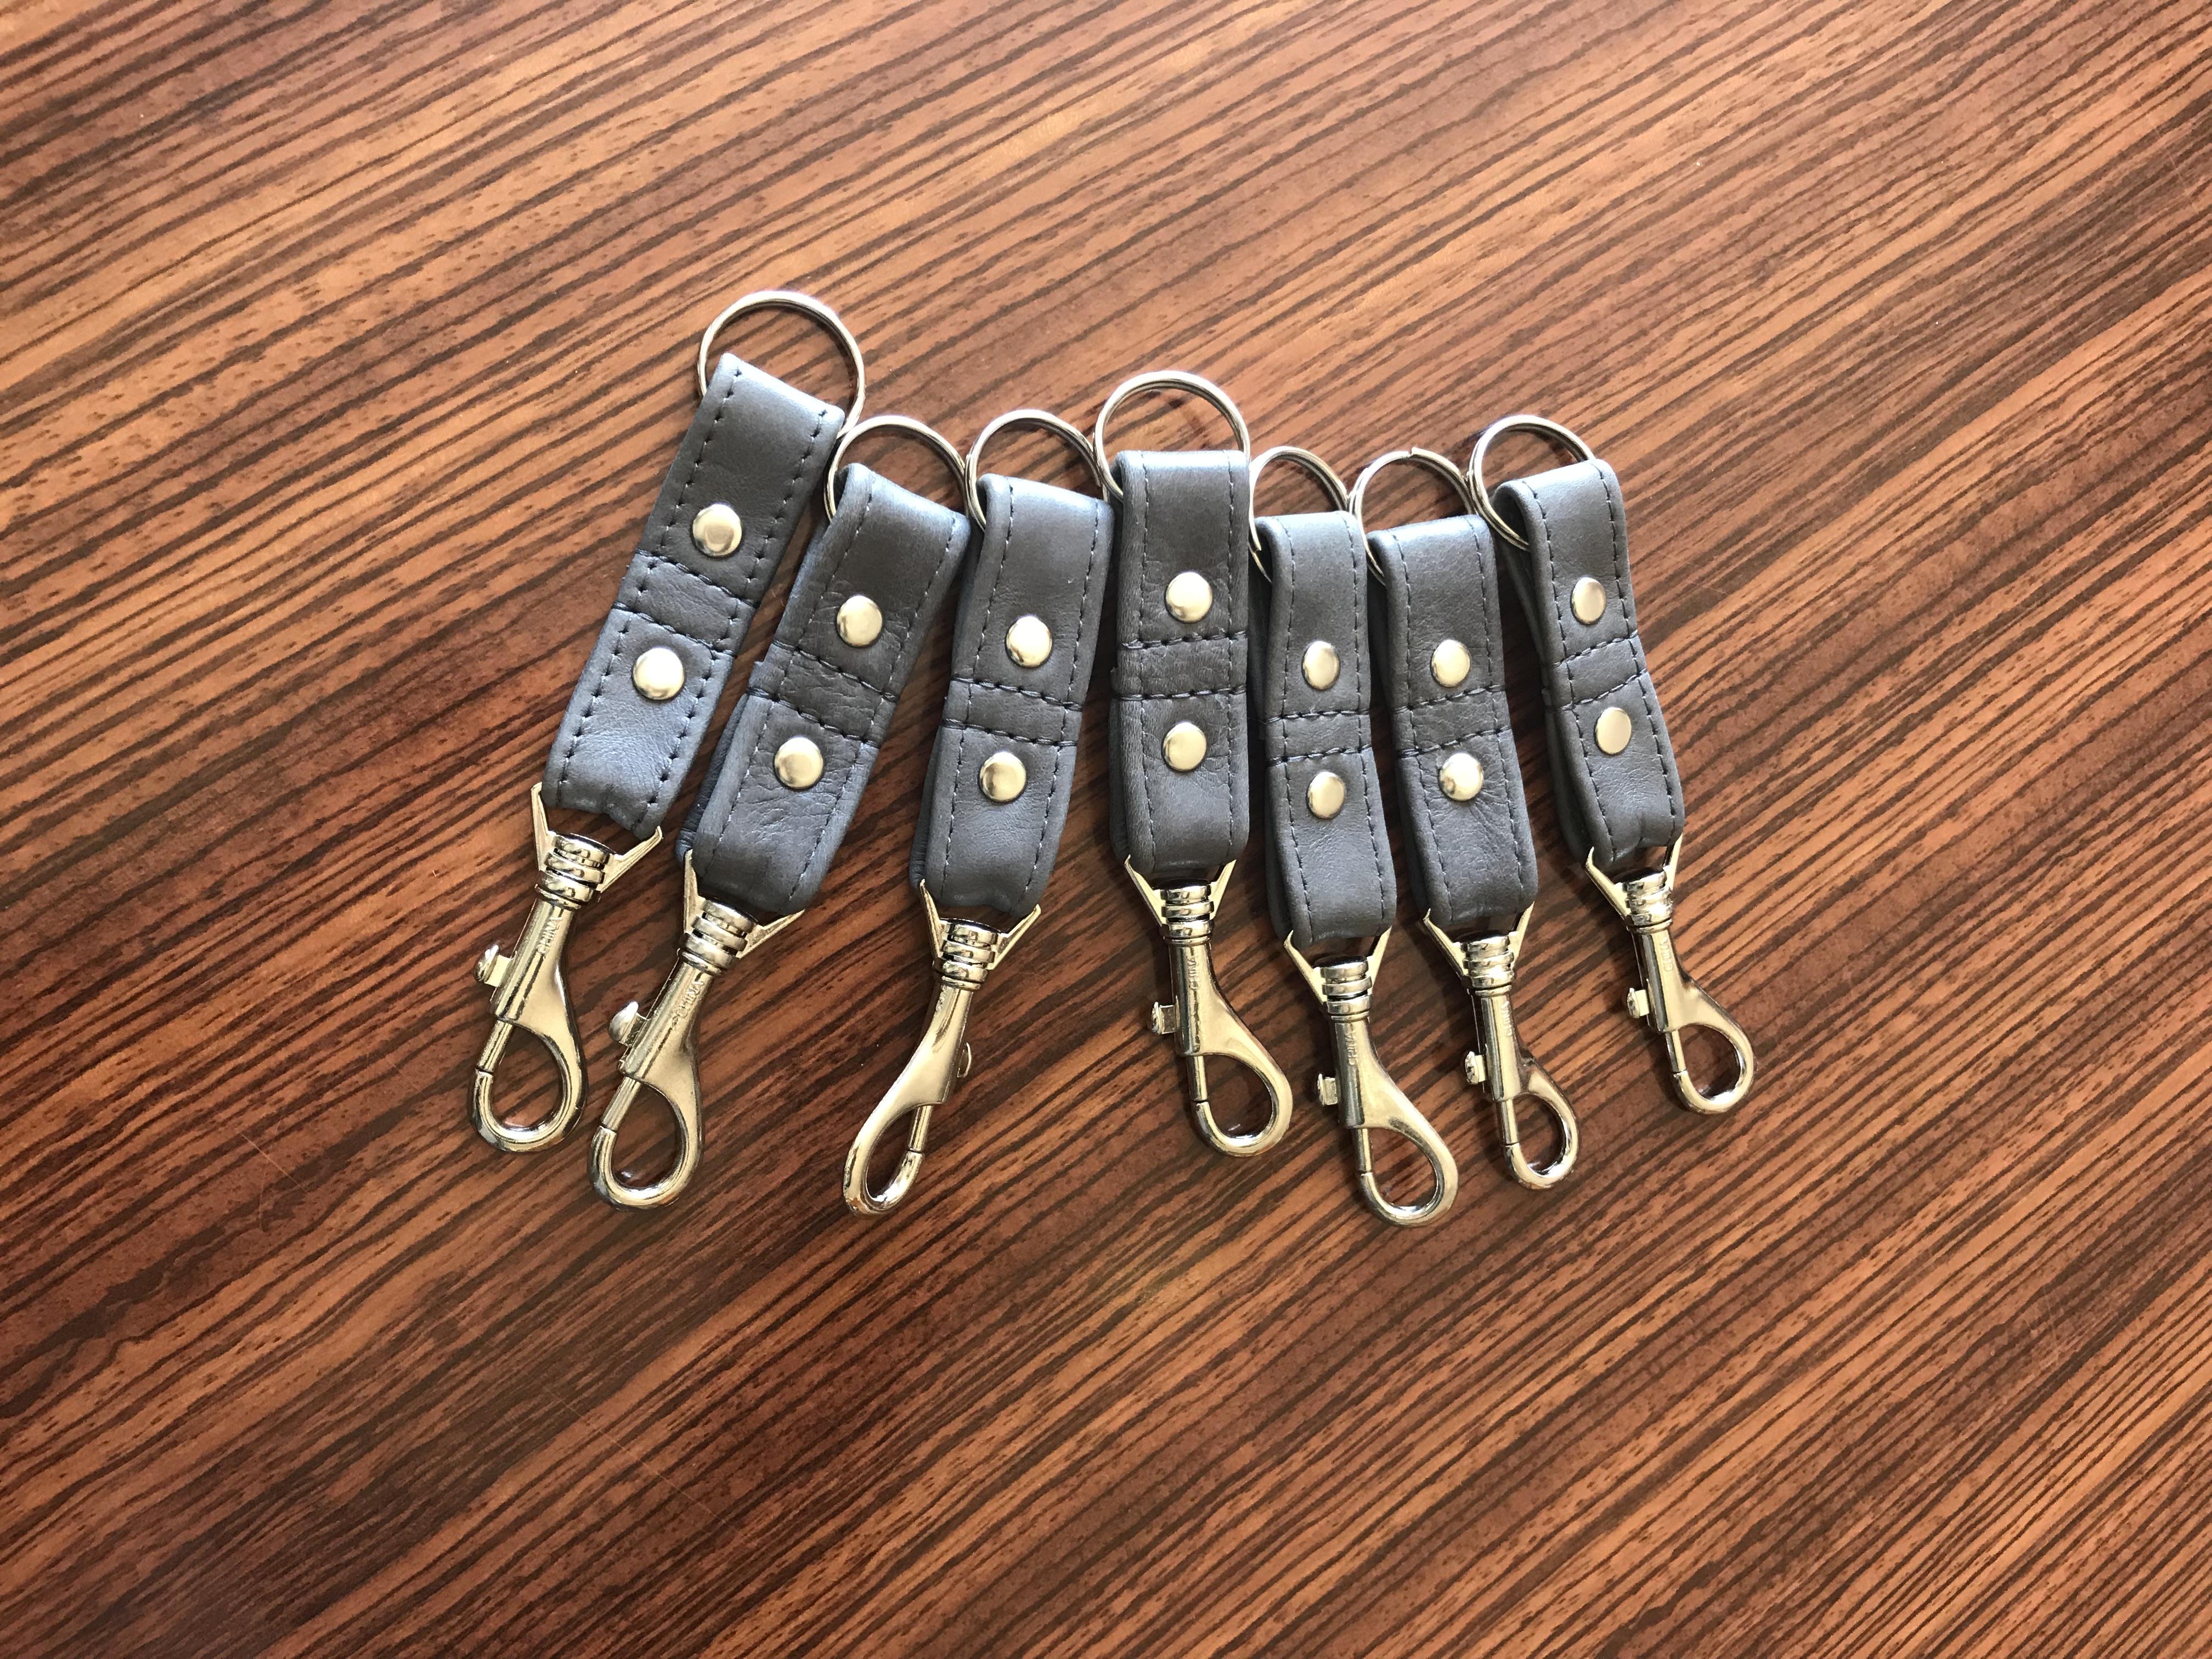 Strap Purses Braided Green Leather Wrist Strap Leather Keychain Key Holder